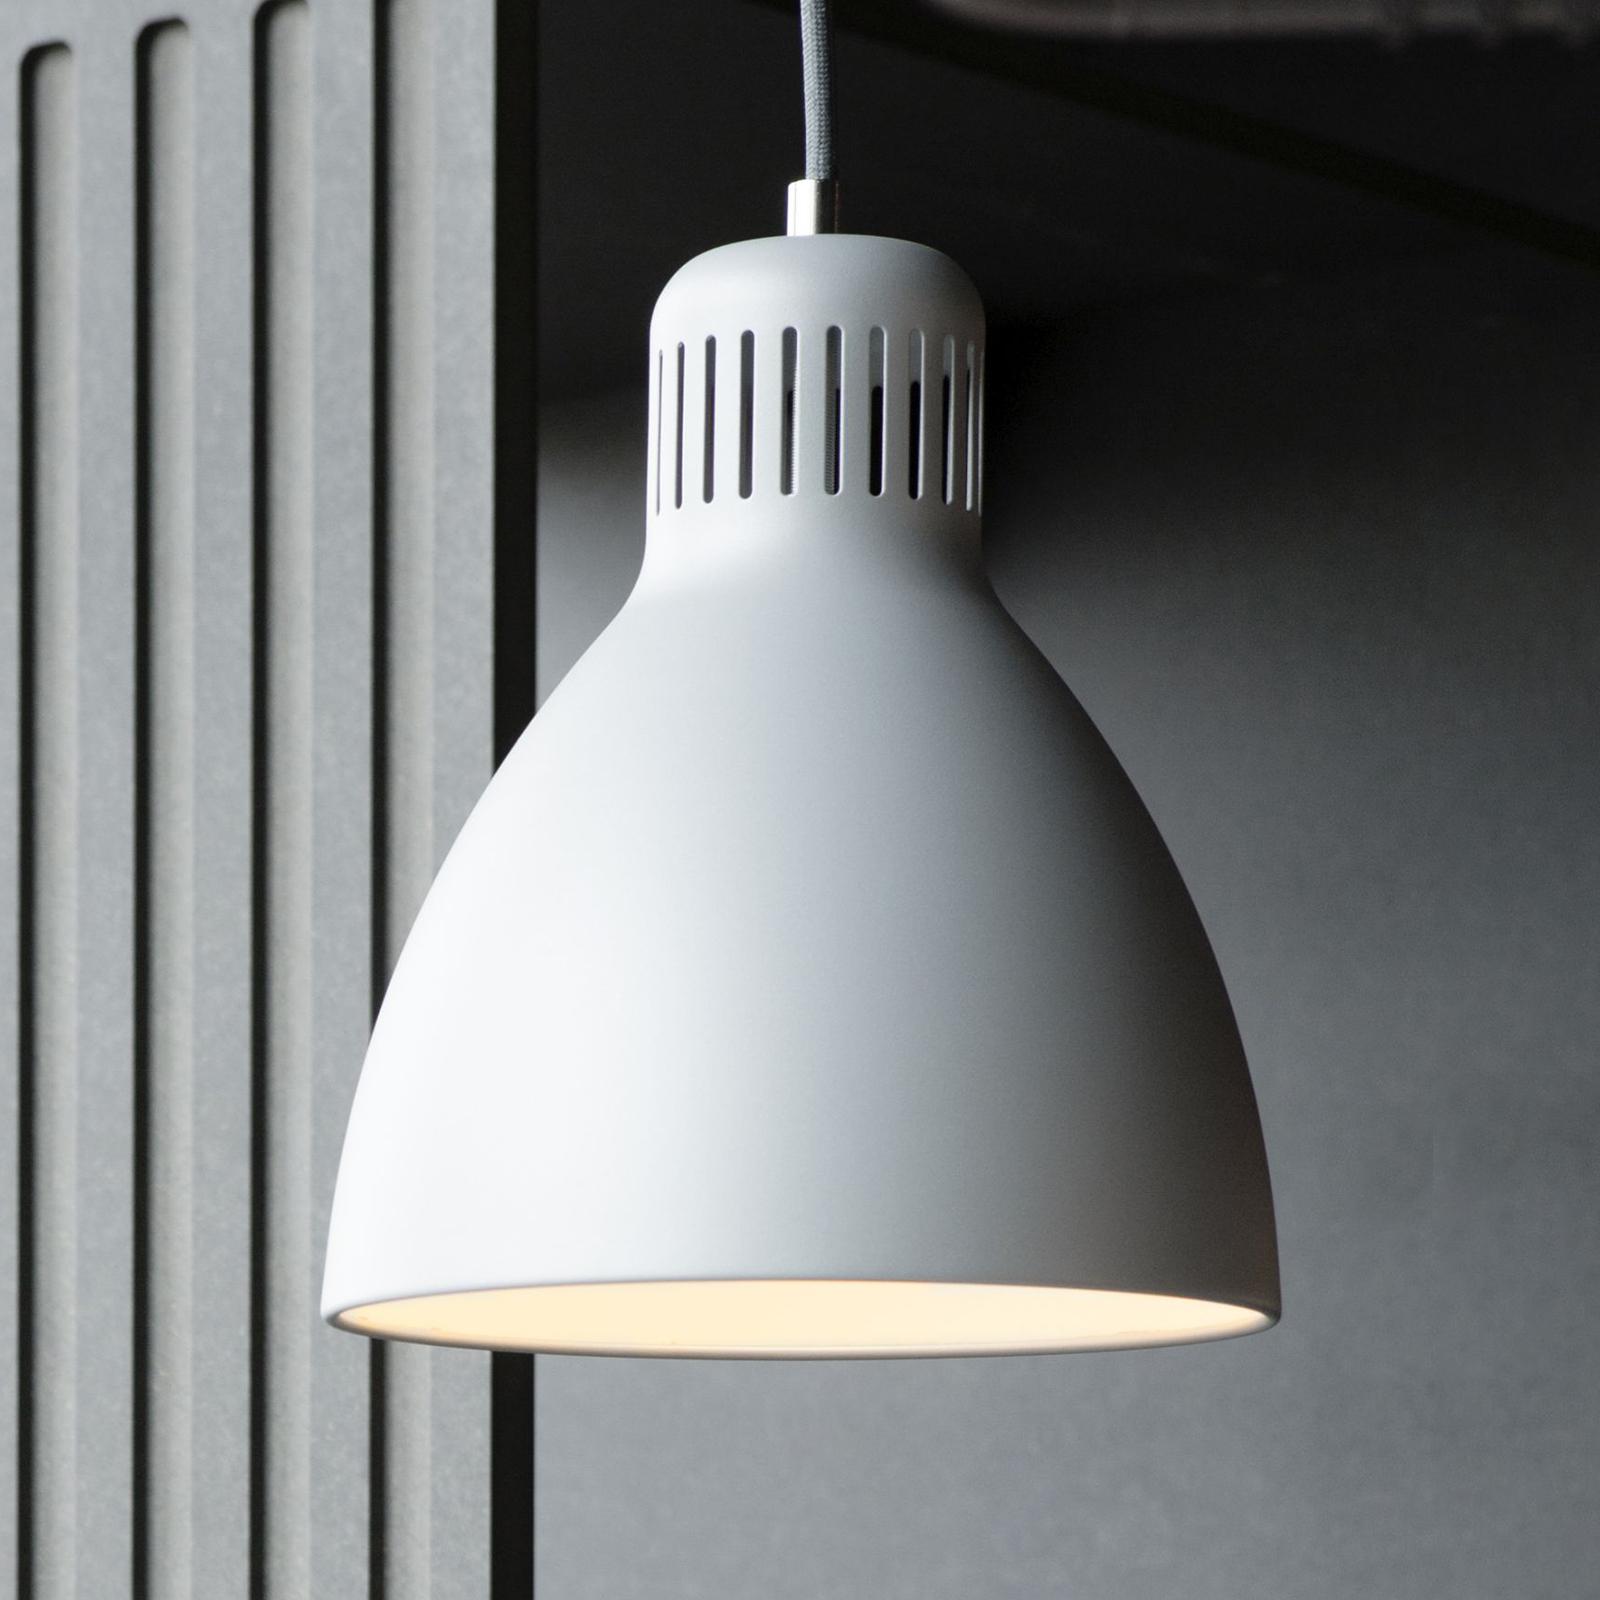 LED-riippuvalaisin L-1, 3 000 K, valkoinen